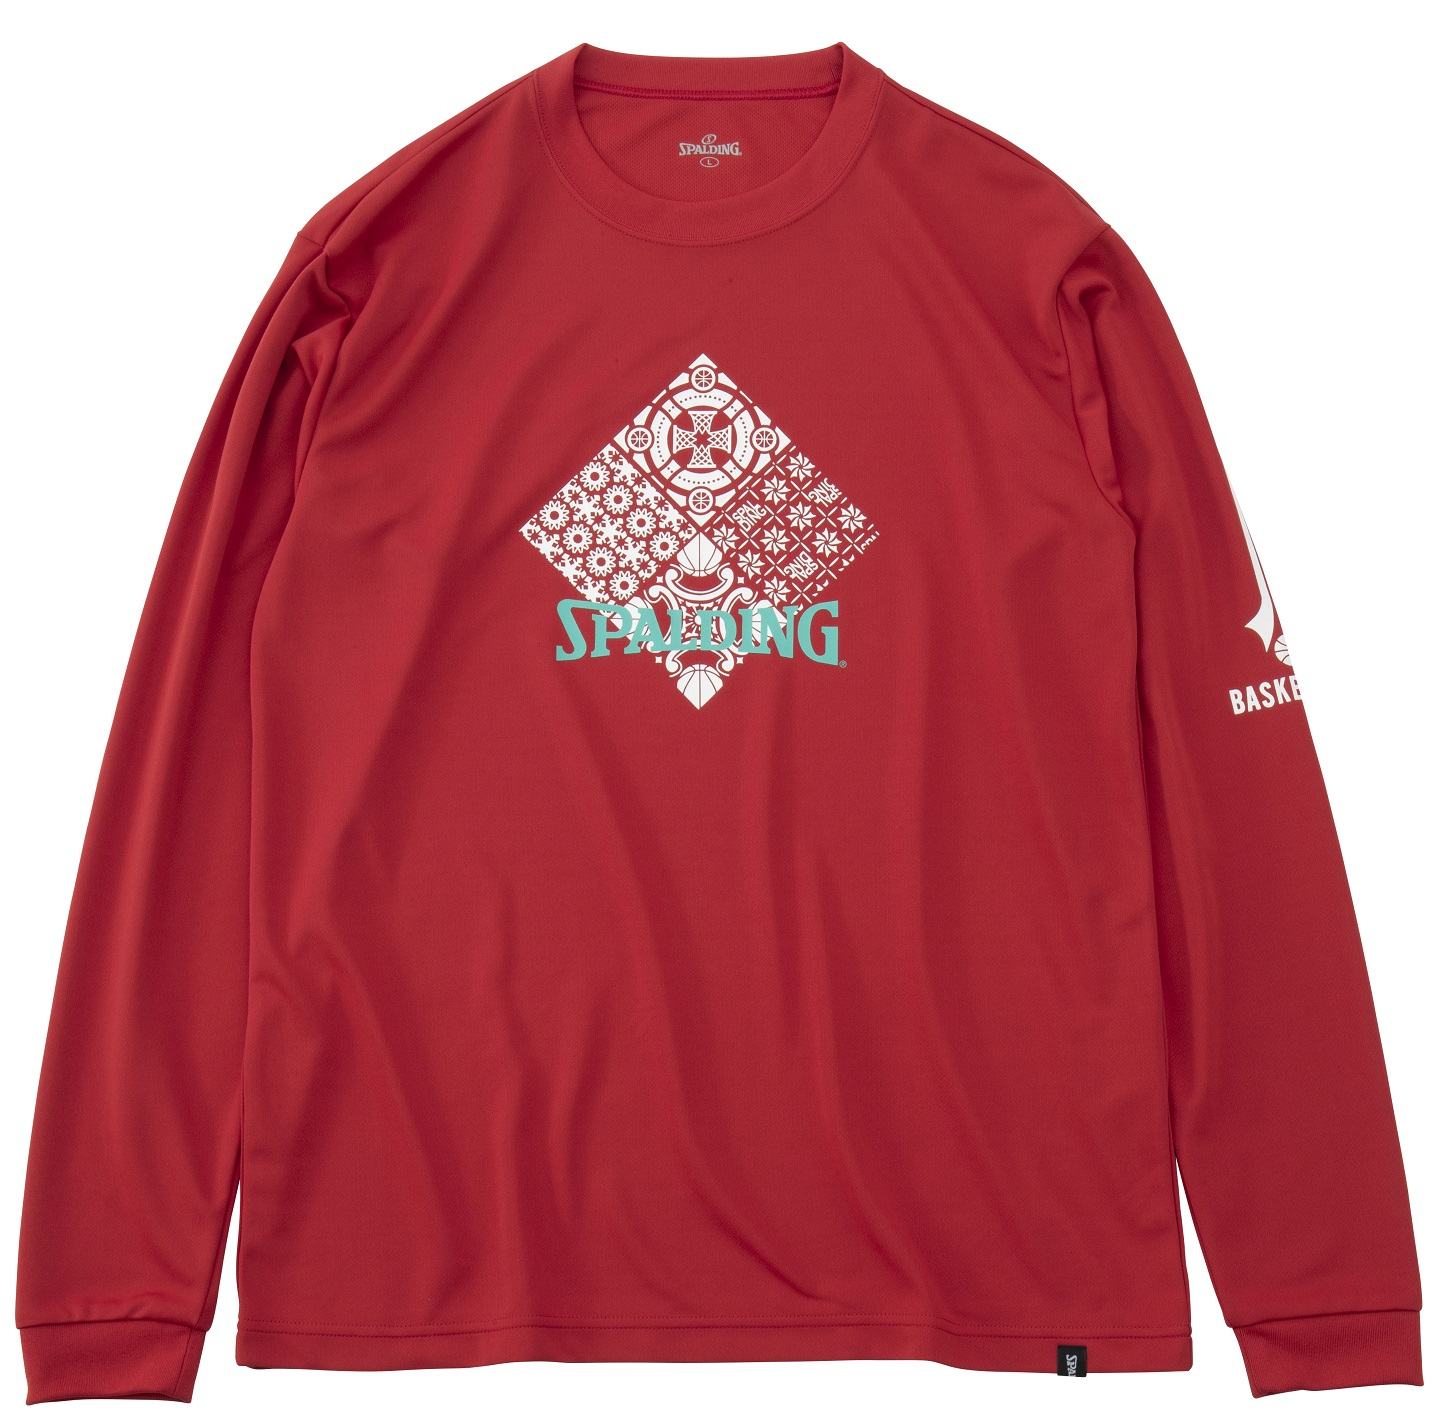 SMT191240 / SPALDING ロングスリーブ Tシャツ / スカンジナビアン / バスケットボール / スポルディング